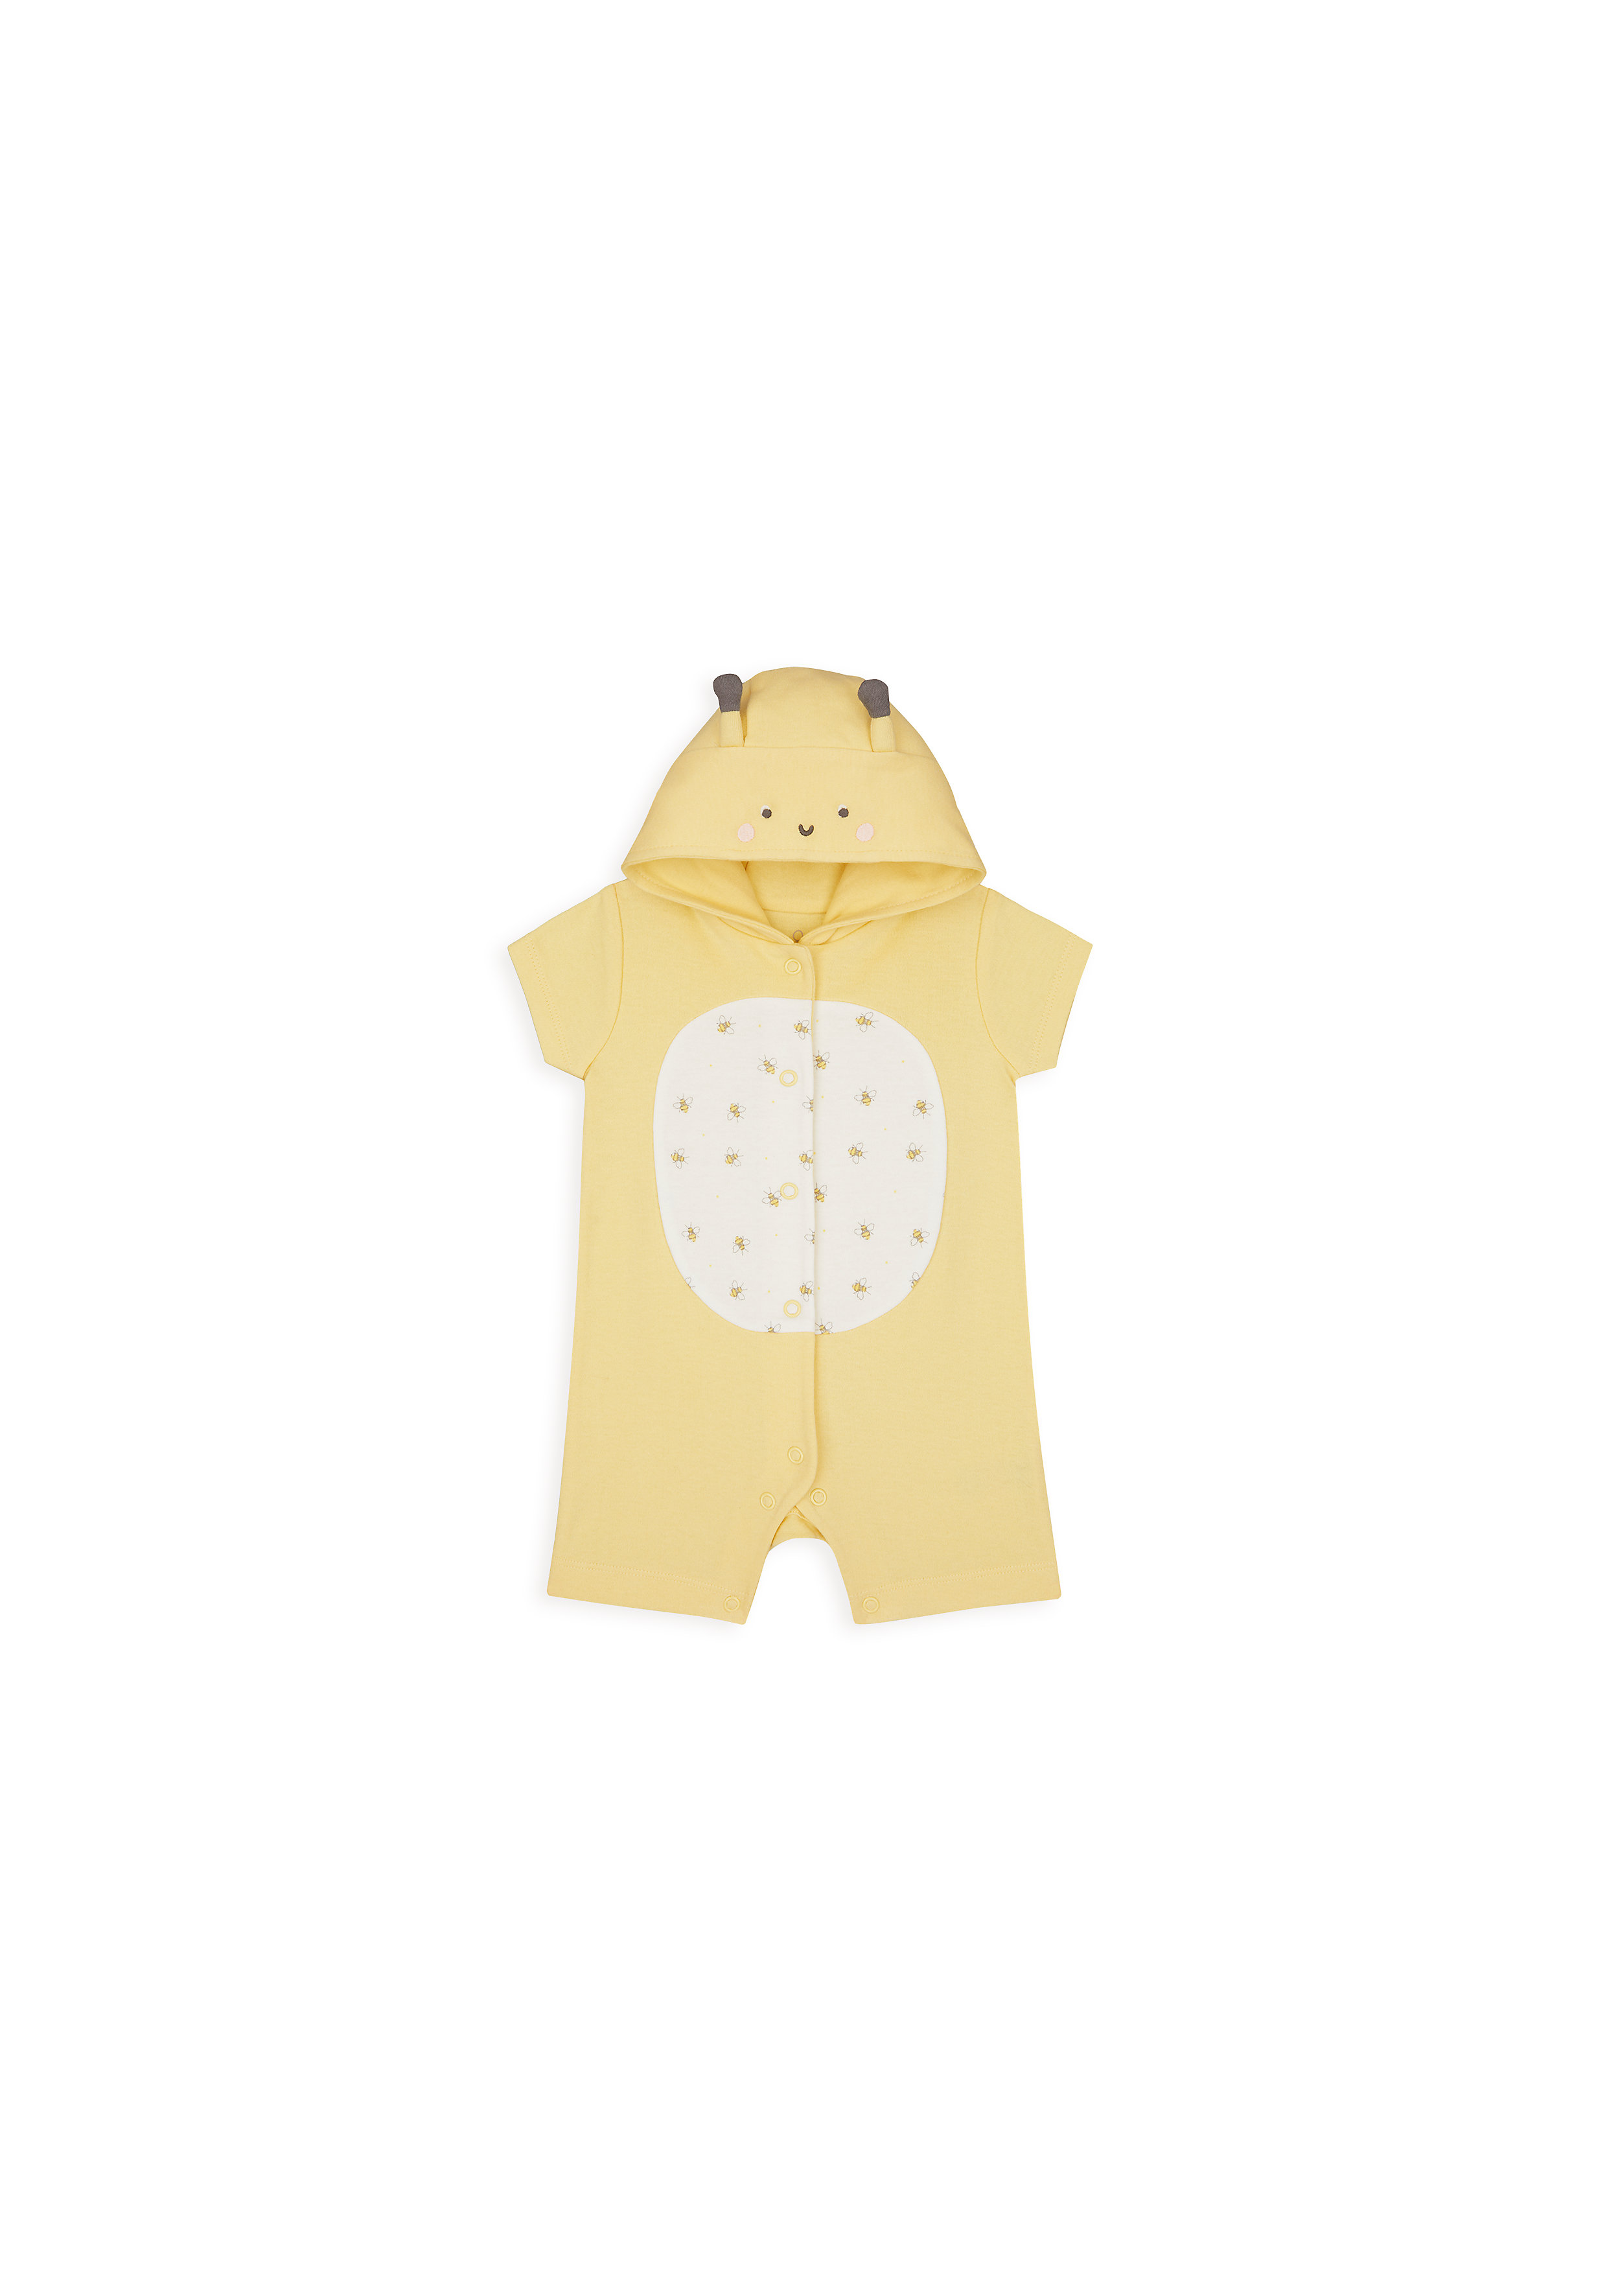 Mothercare | Girls Half Sleeves Romper Bee 3D Details - Yellow